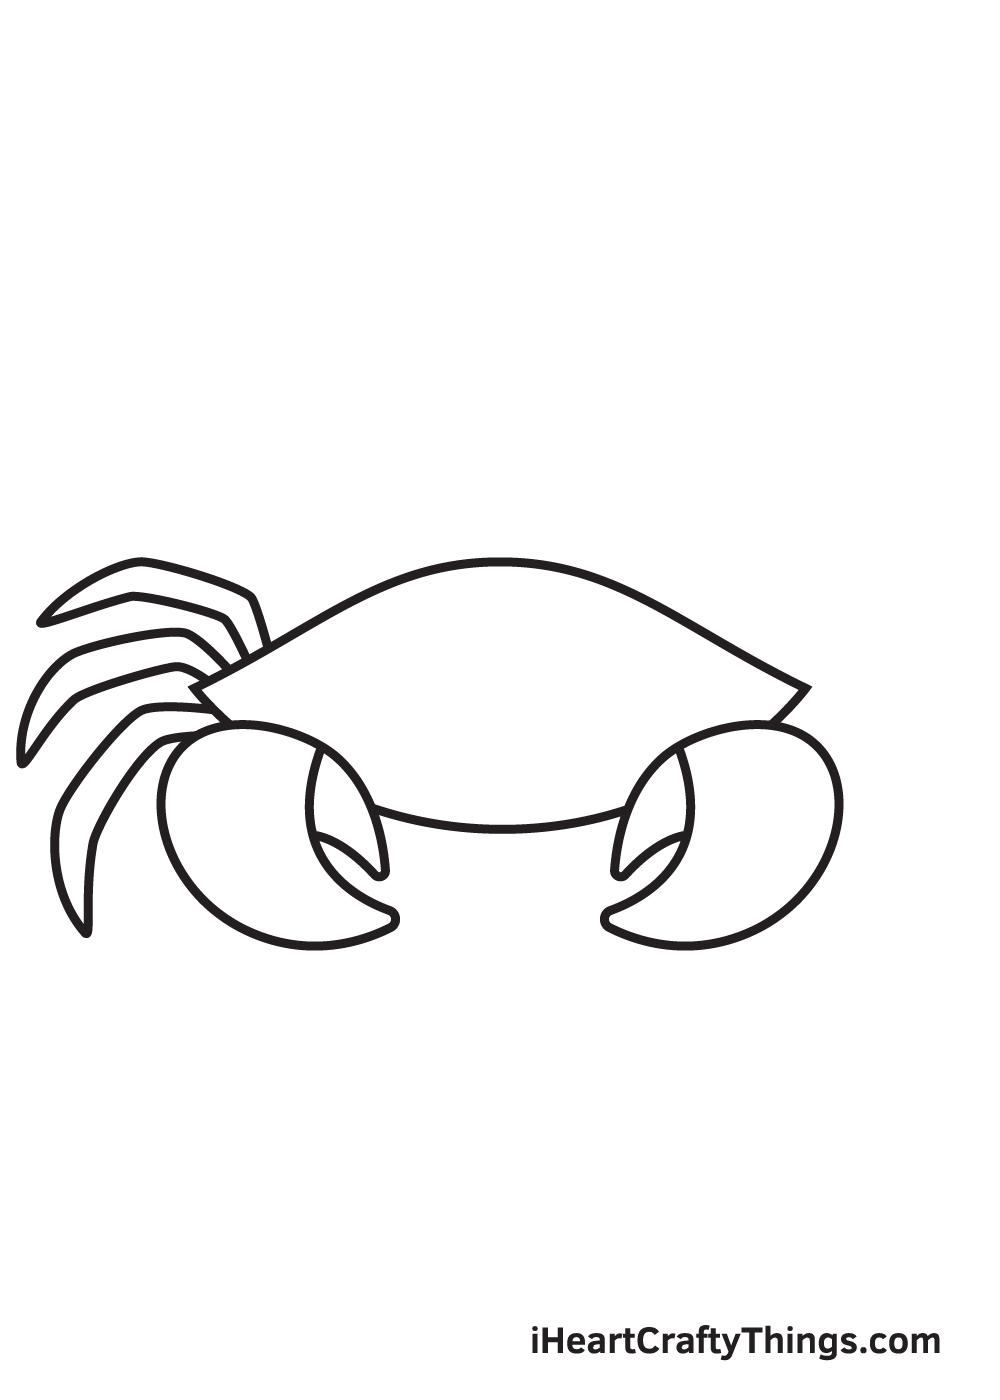 Crab Drawing – Step 4